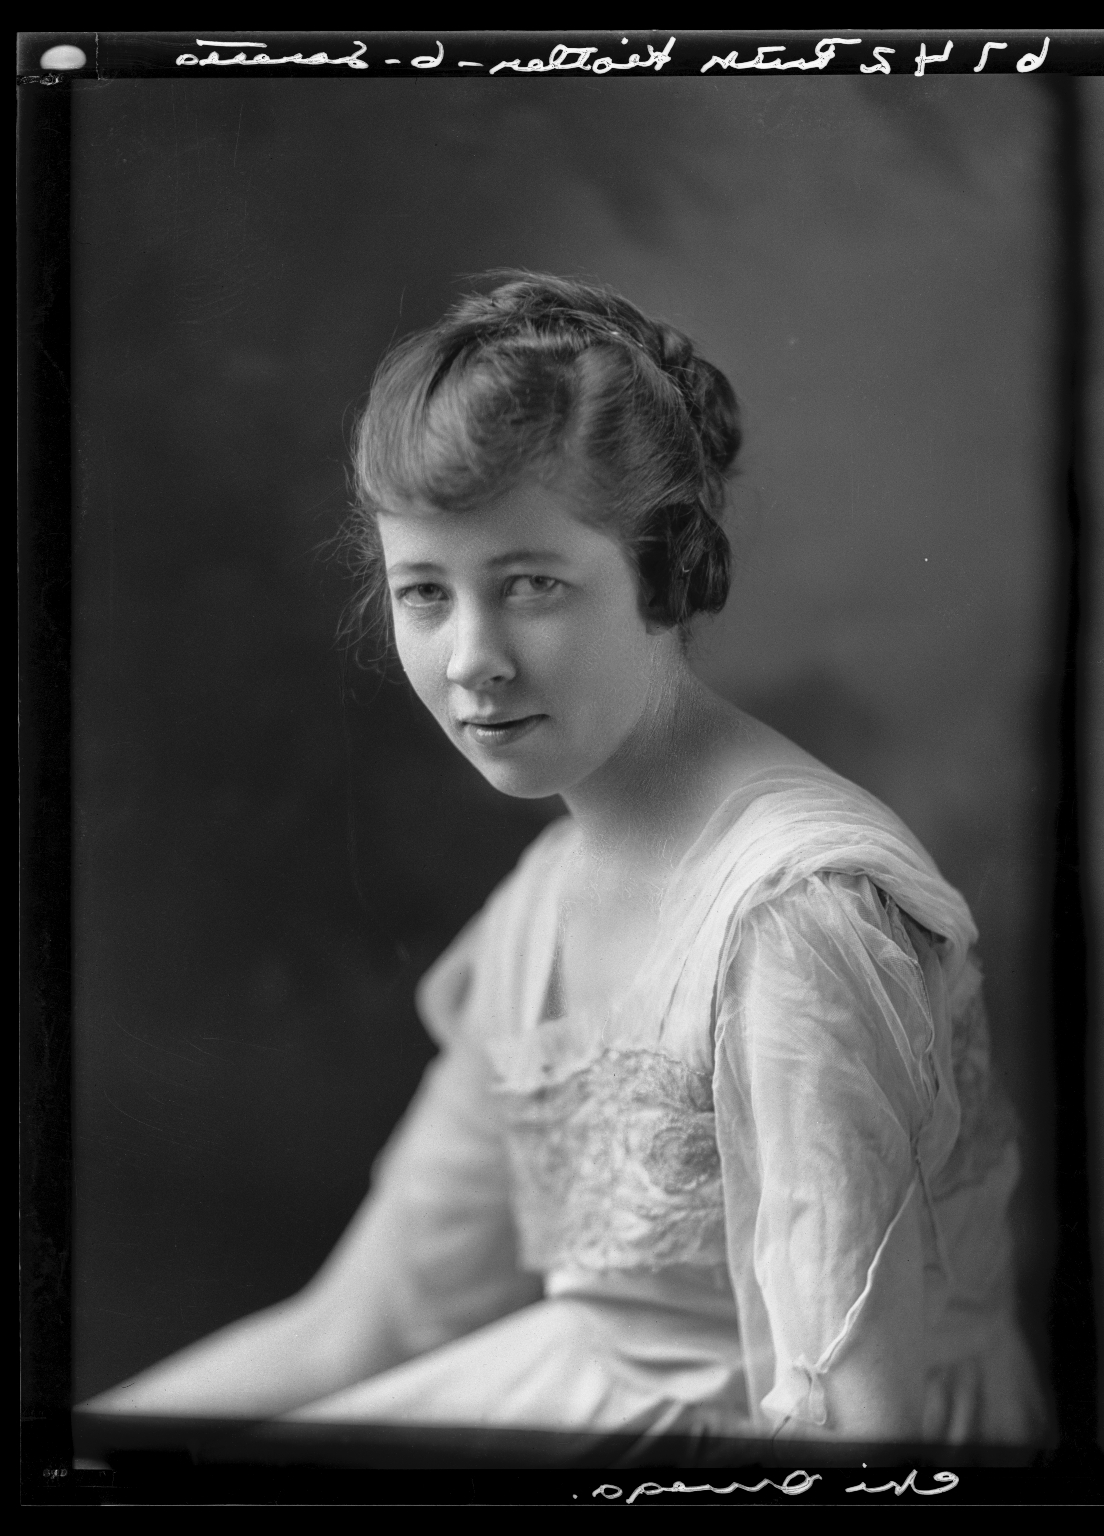 Portraits of Ruth Kistler